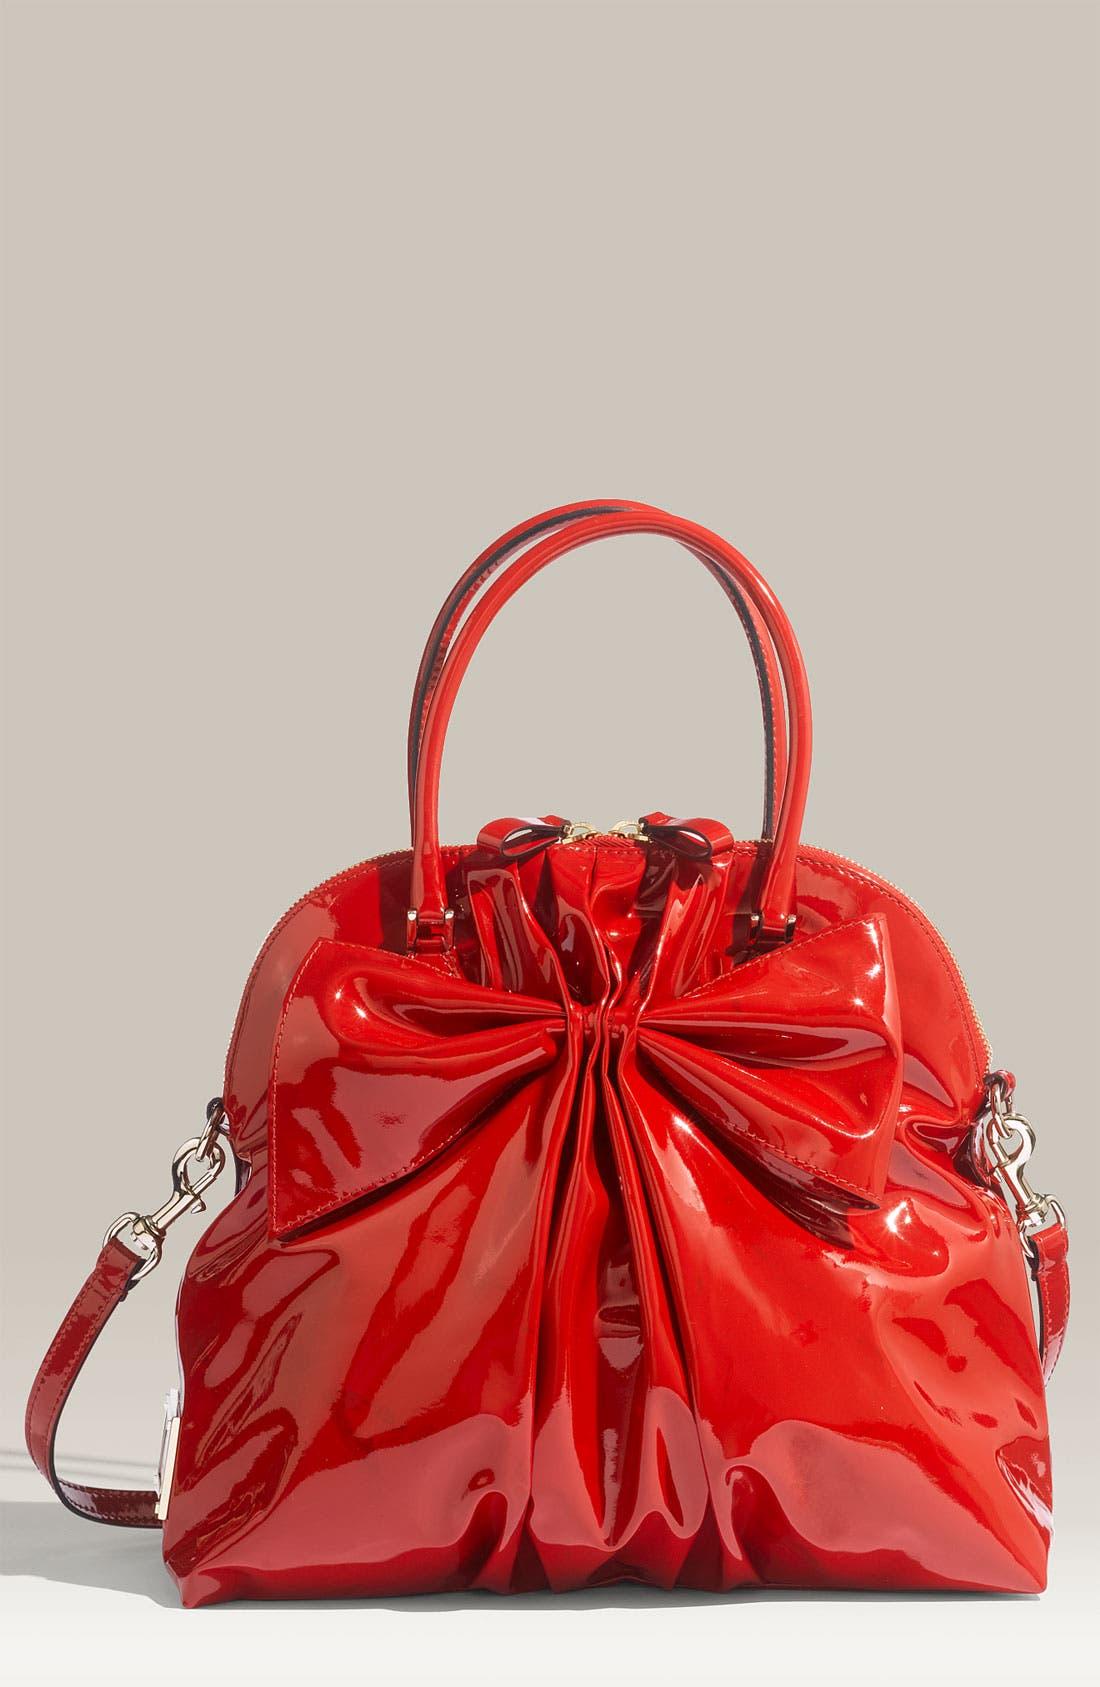 Main Image - Valentino 'Bon Bon Dome Bow' Patent Leather Satchel